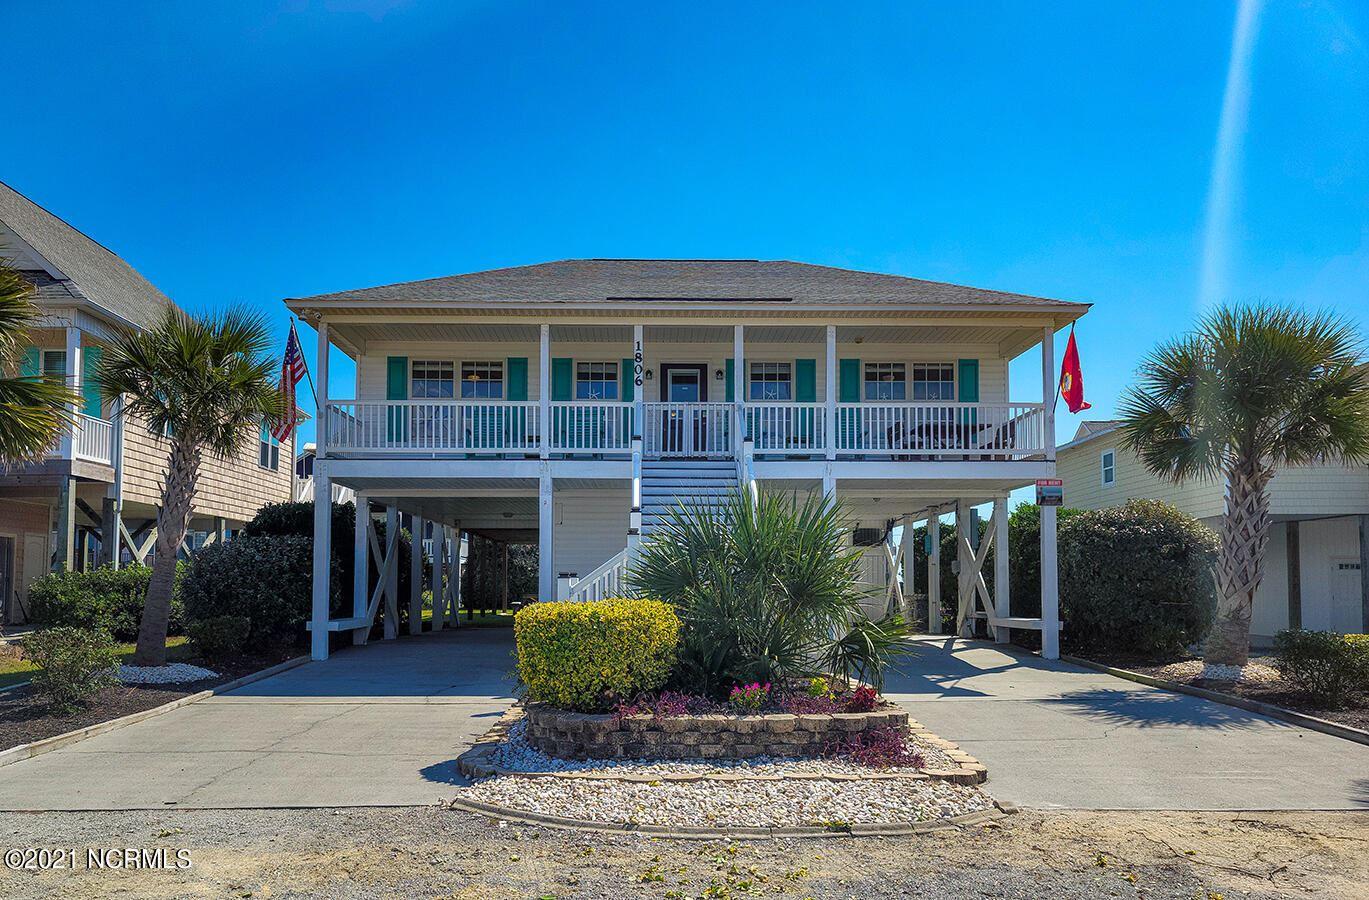 Photo of 1806 N New River Drive, Surf City, NC 28445 (MLS # 100293847)